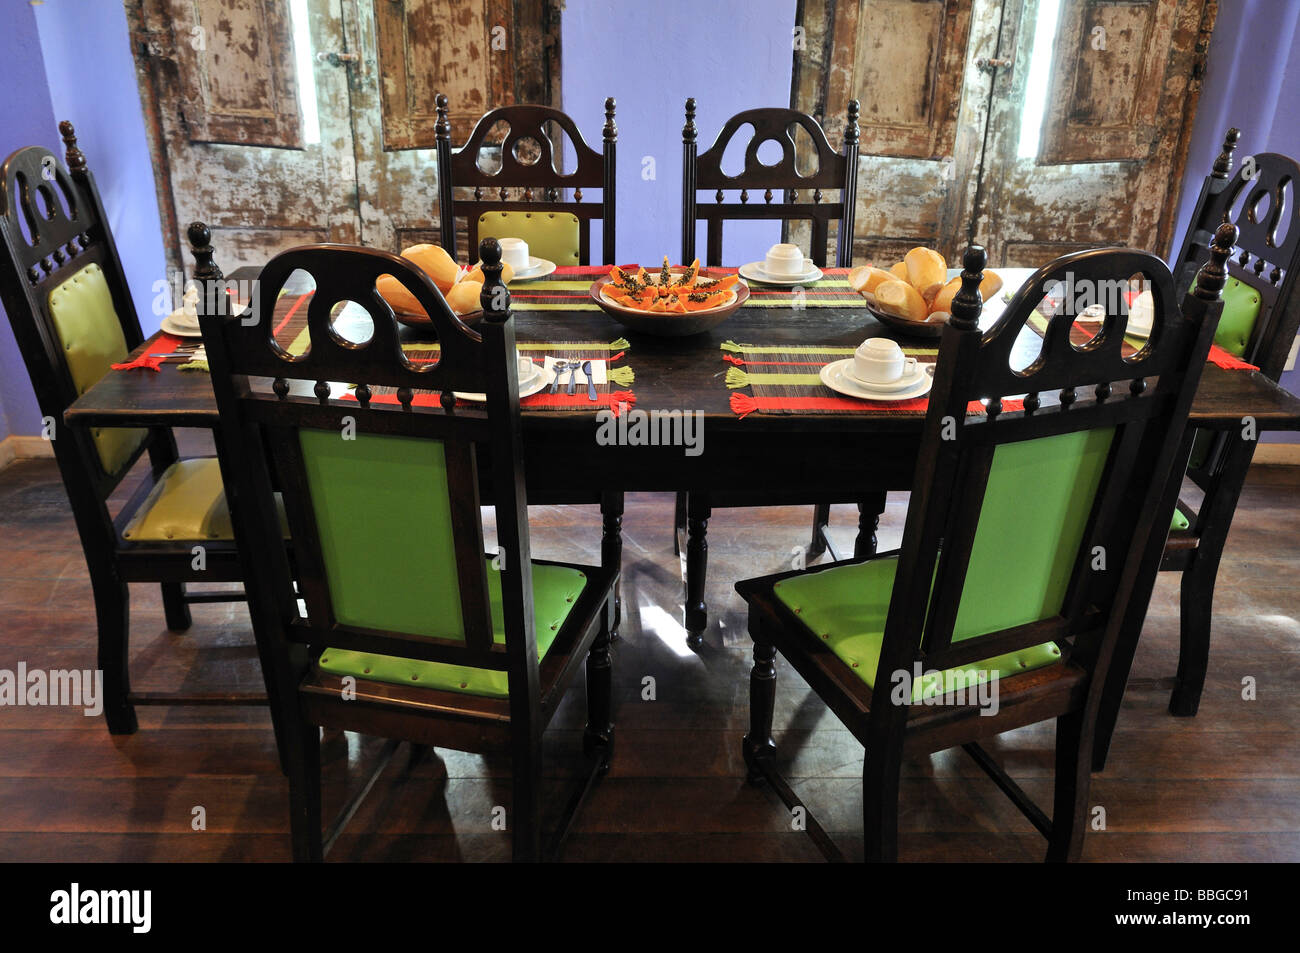 Stylish laid out breakfast table, Hotel Cafe Bahia, Salvador, Bahia, Brazil, South America - Stock Image